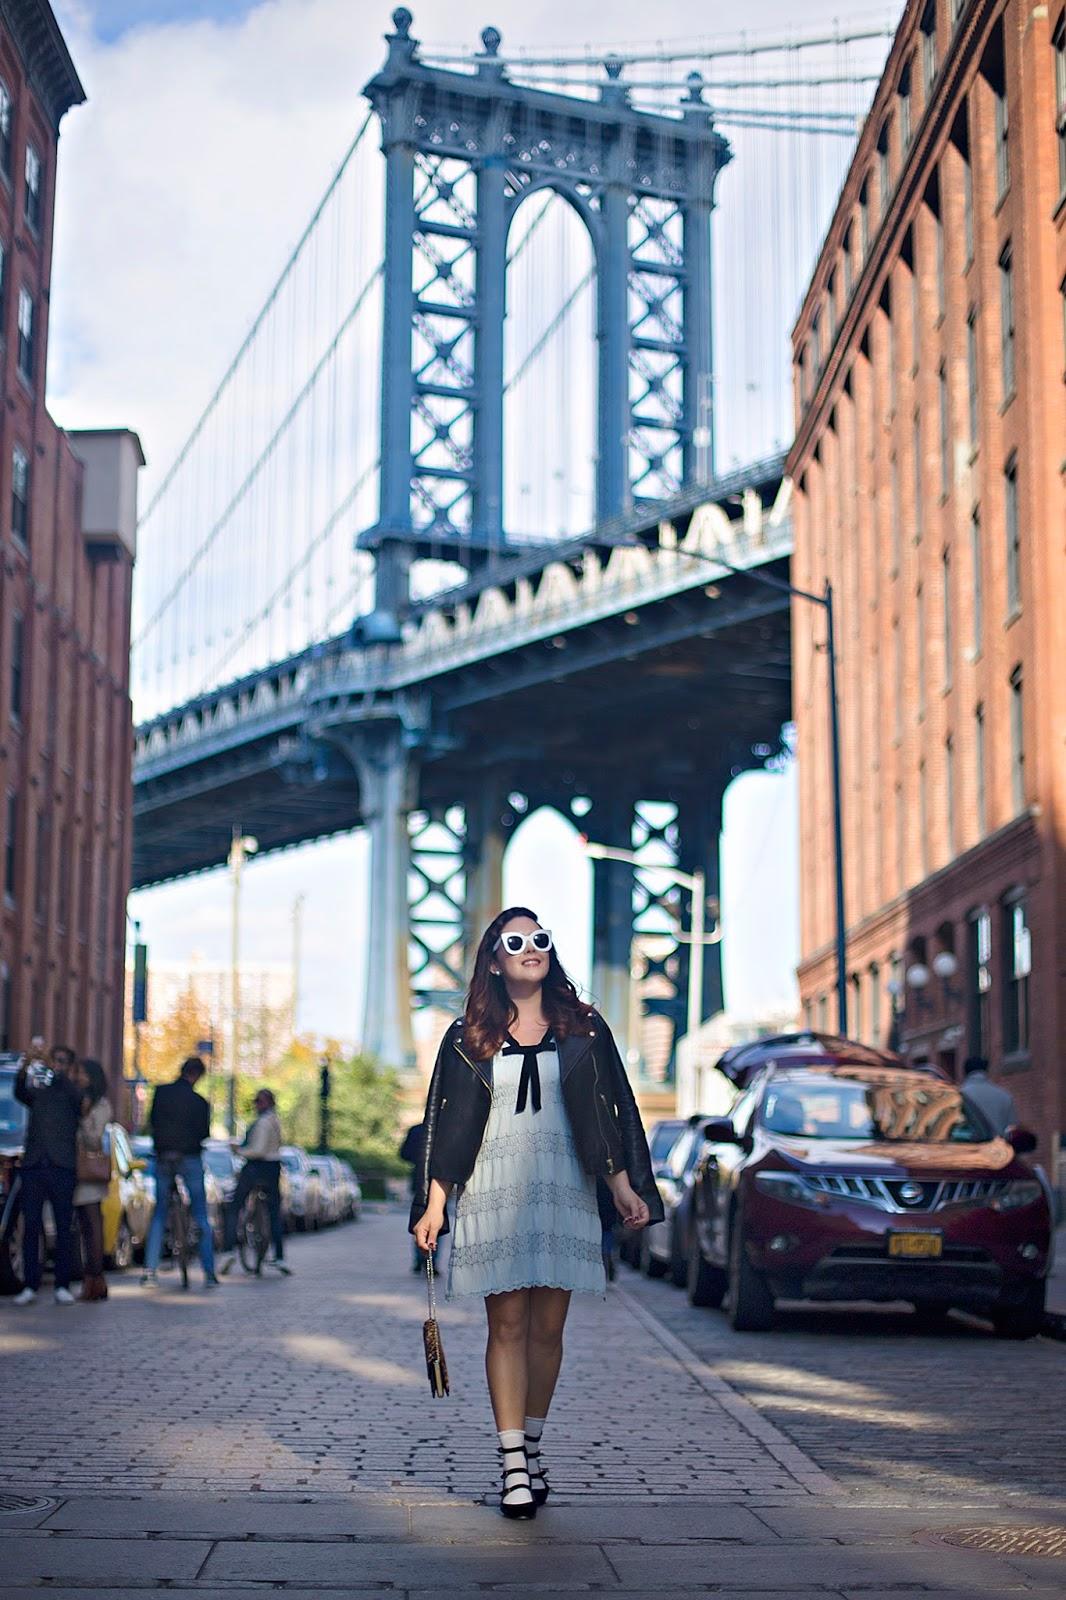 Dumbo Brooklyn, Best Istagram Shots in New York City